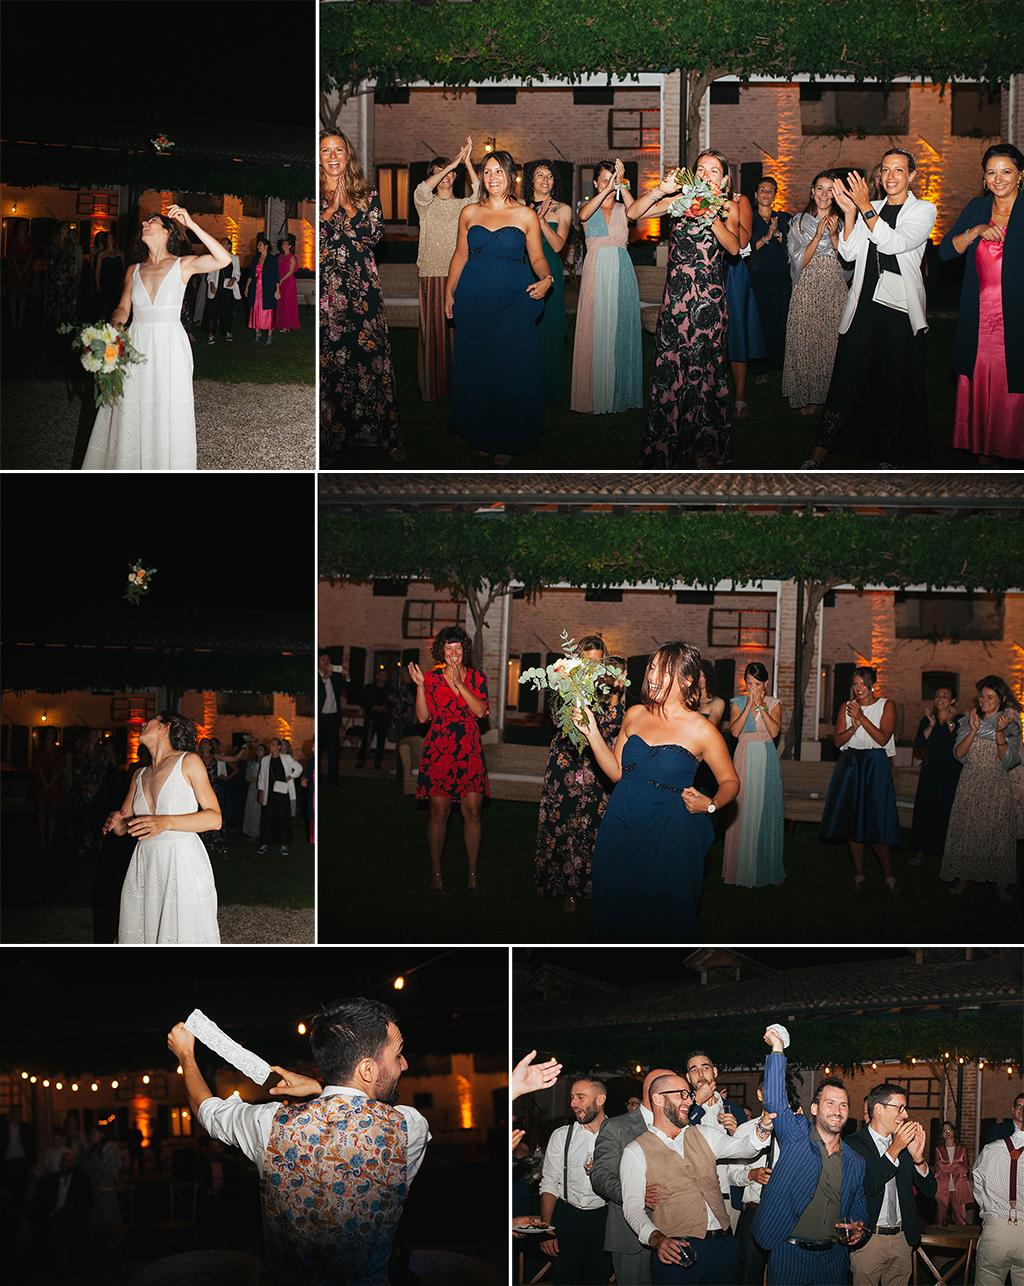 matrimonio le risare padova conegliano treviso veneto Deborah Brugnera ricevimento matrimonio lancio bouquet